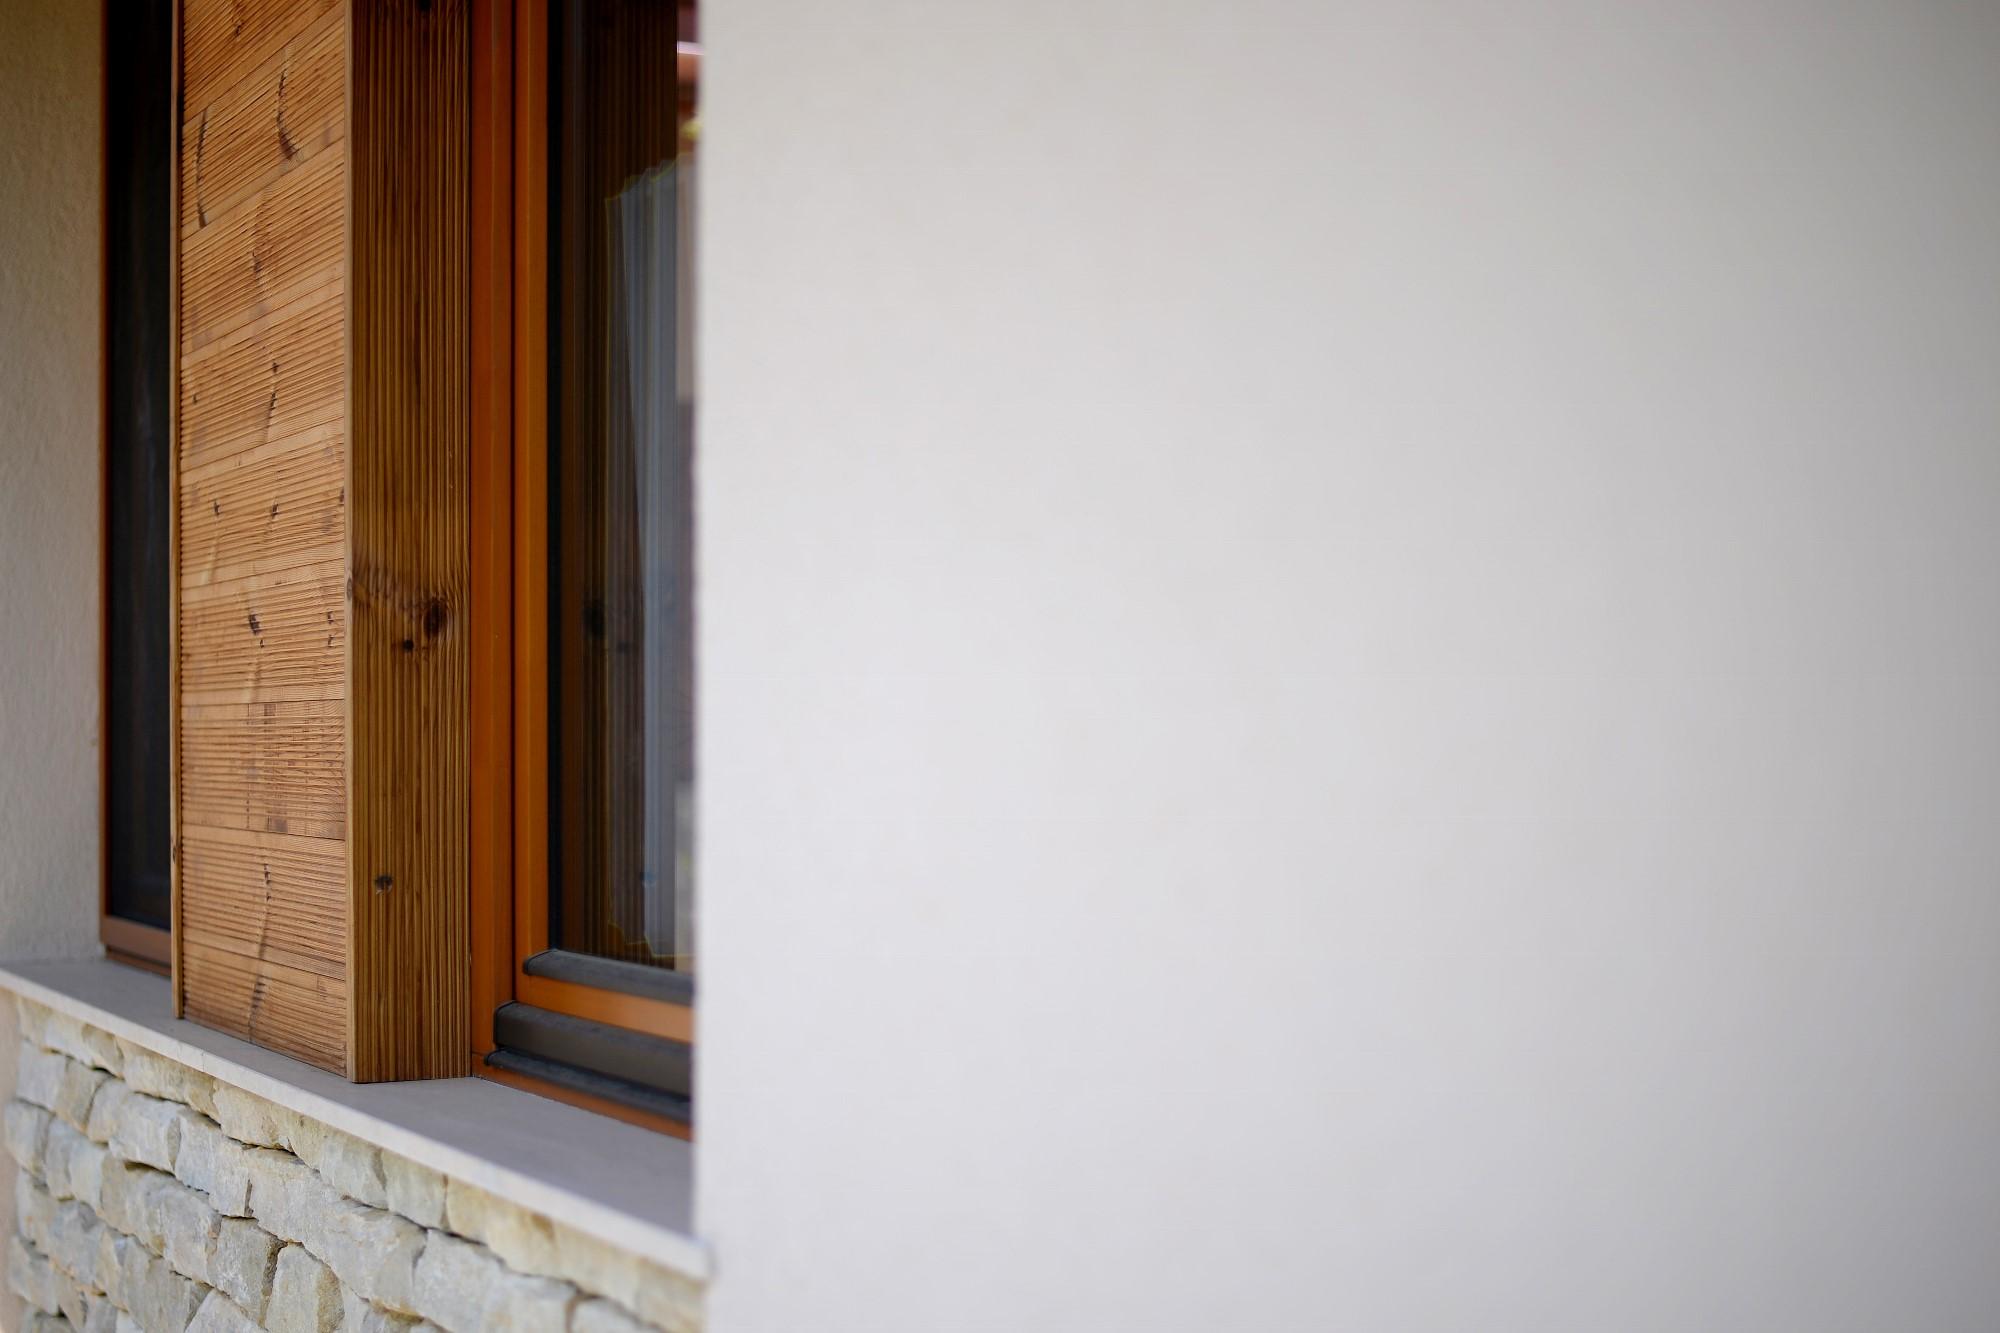 Leányfalu - Családi ház 175 m2